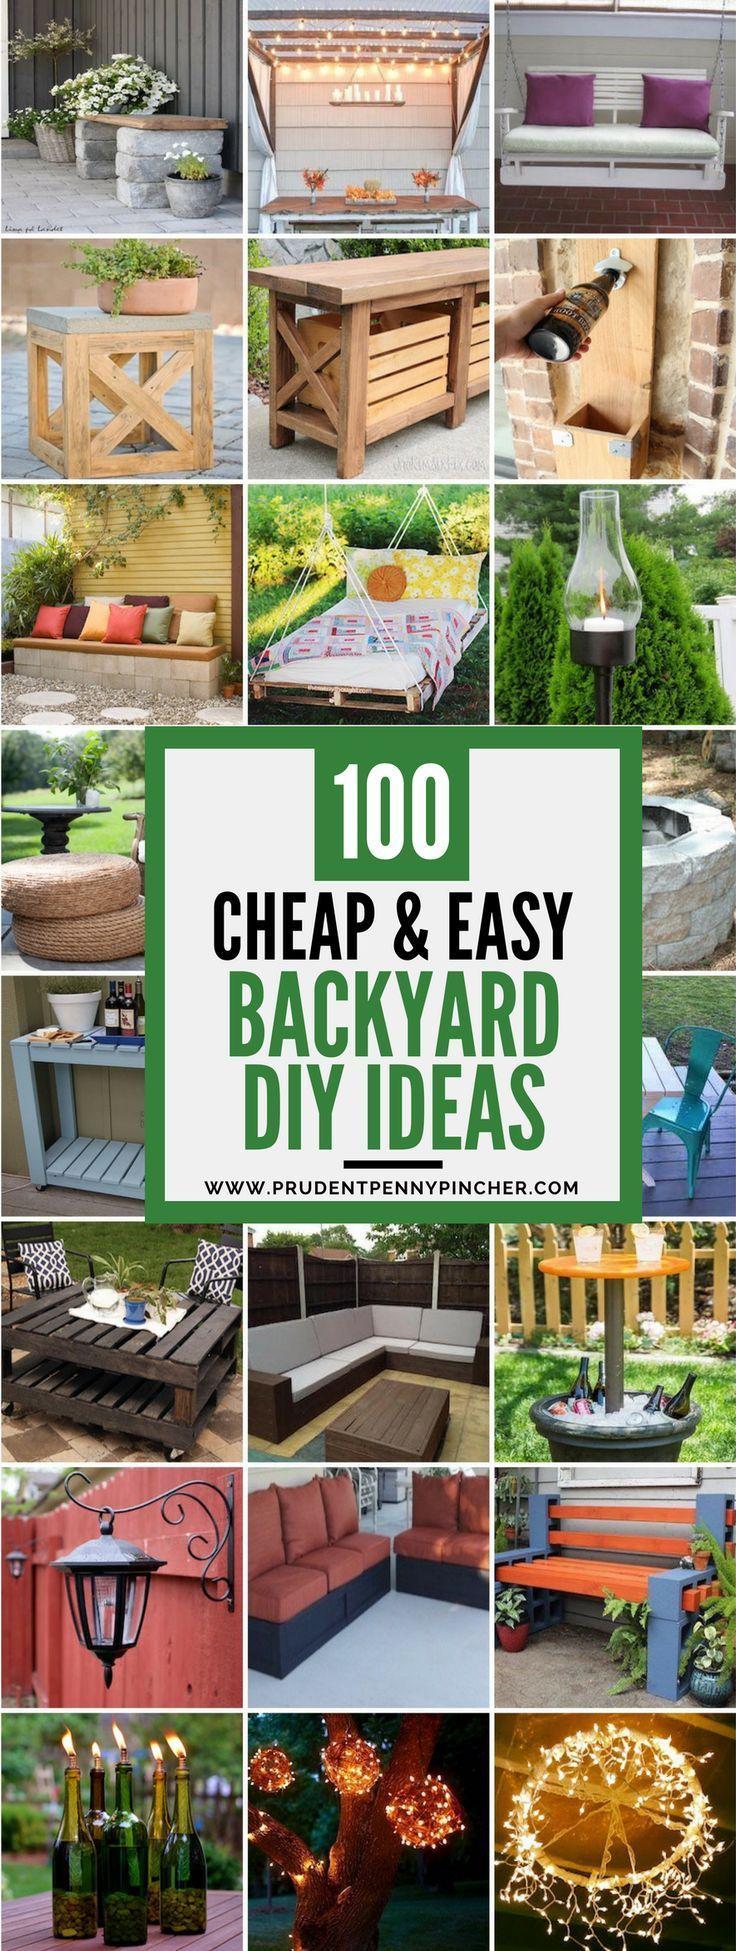 100 Cheap And Easy Diy Backyard Ideas Easy Backyard Diy Easy Backyard Diy Backyard